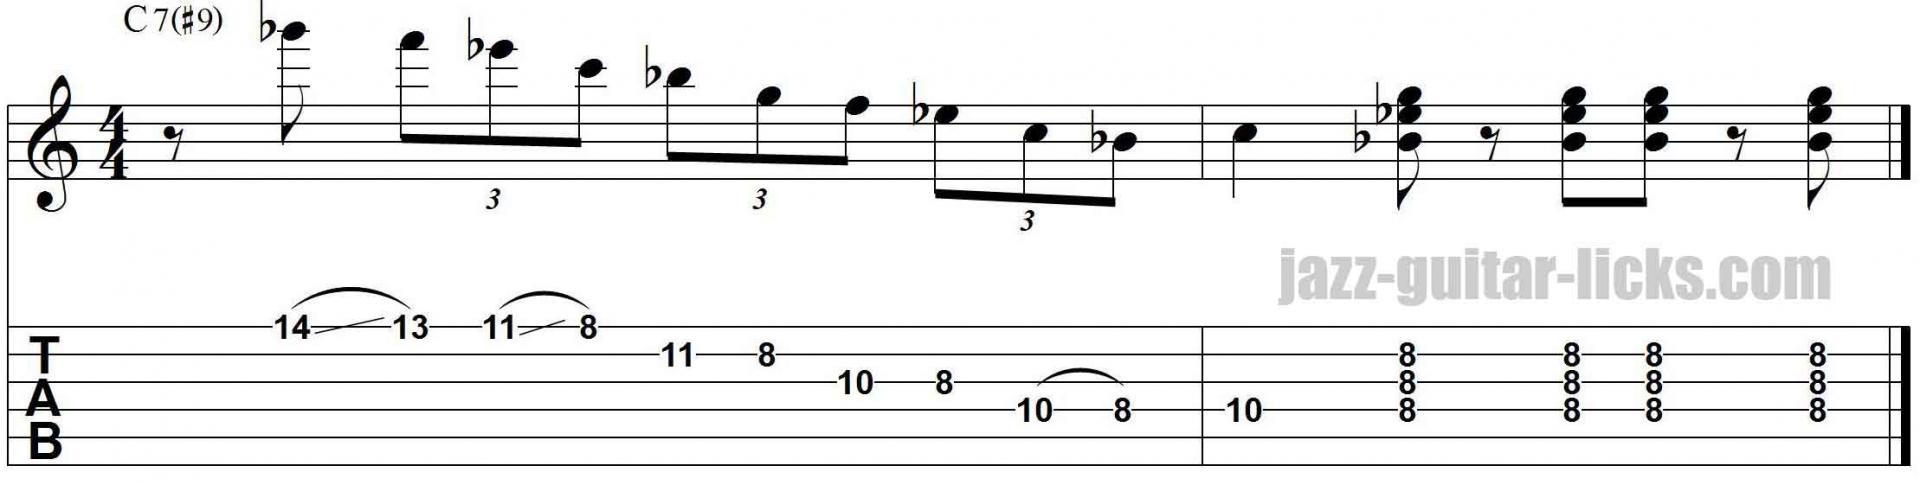 Kenny burrell jazz guitar lick